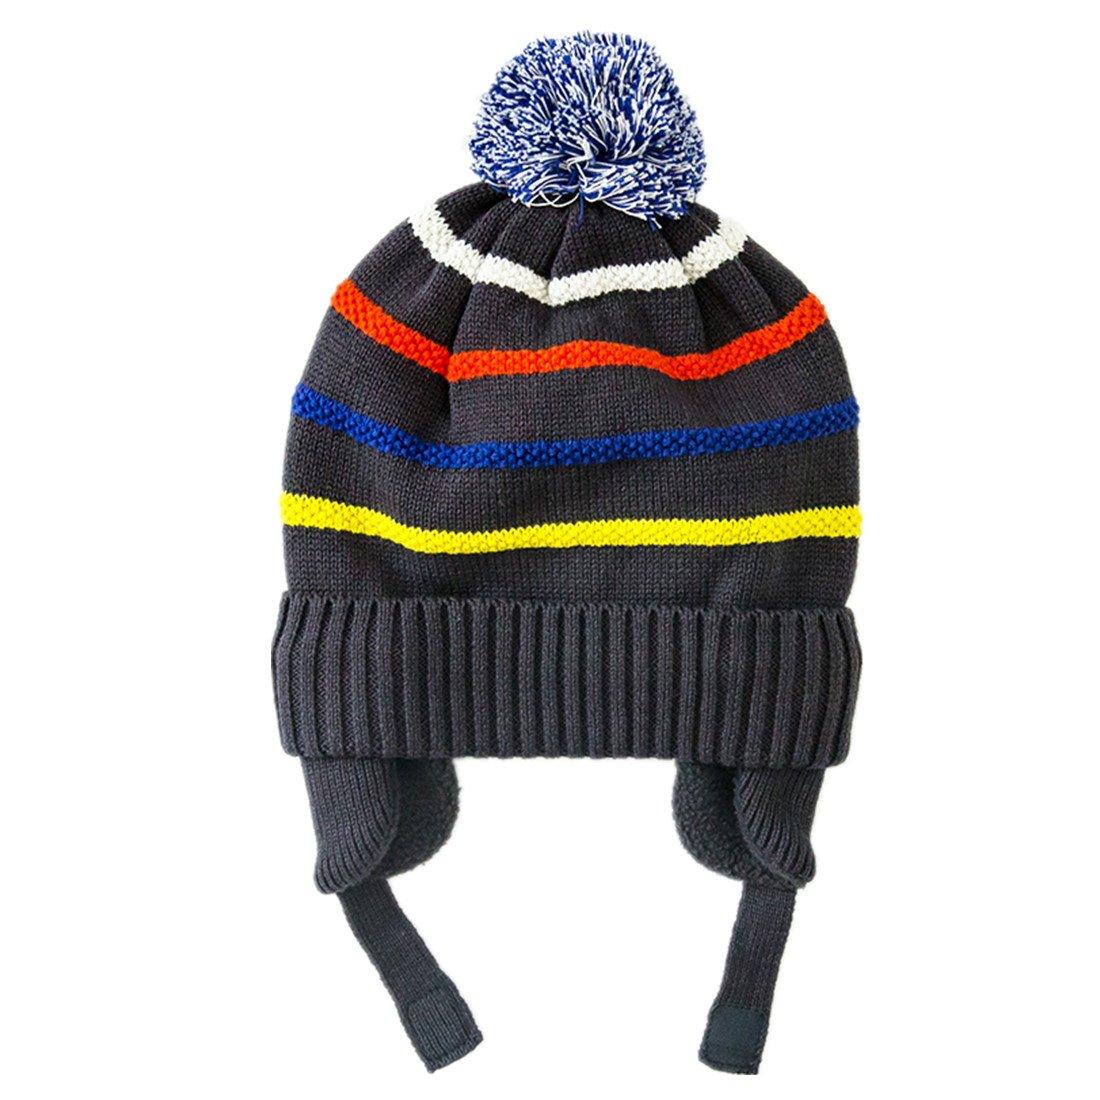 Connectyle Boys Kids Striped Knit Beanie Hat with Earflap Warm Cuff Winter Cap (XL:4T-7T(20.5''-21.3'' Head Girth))